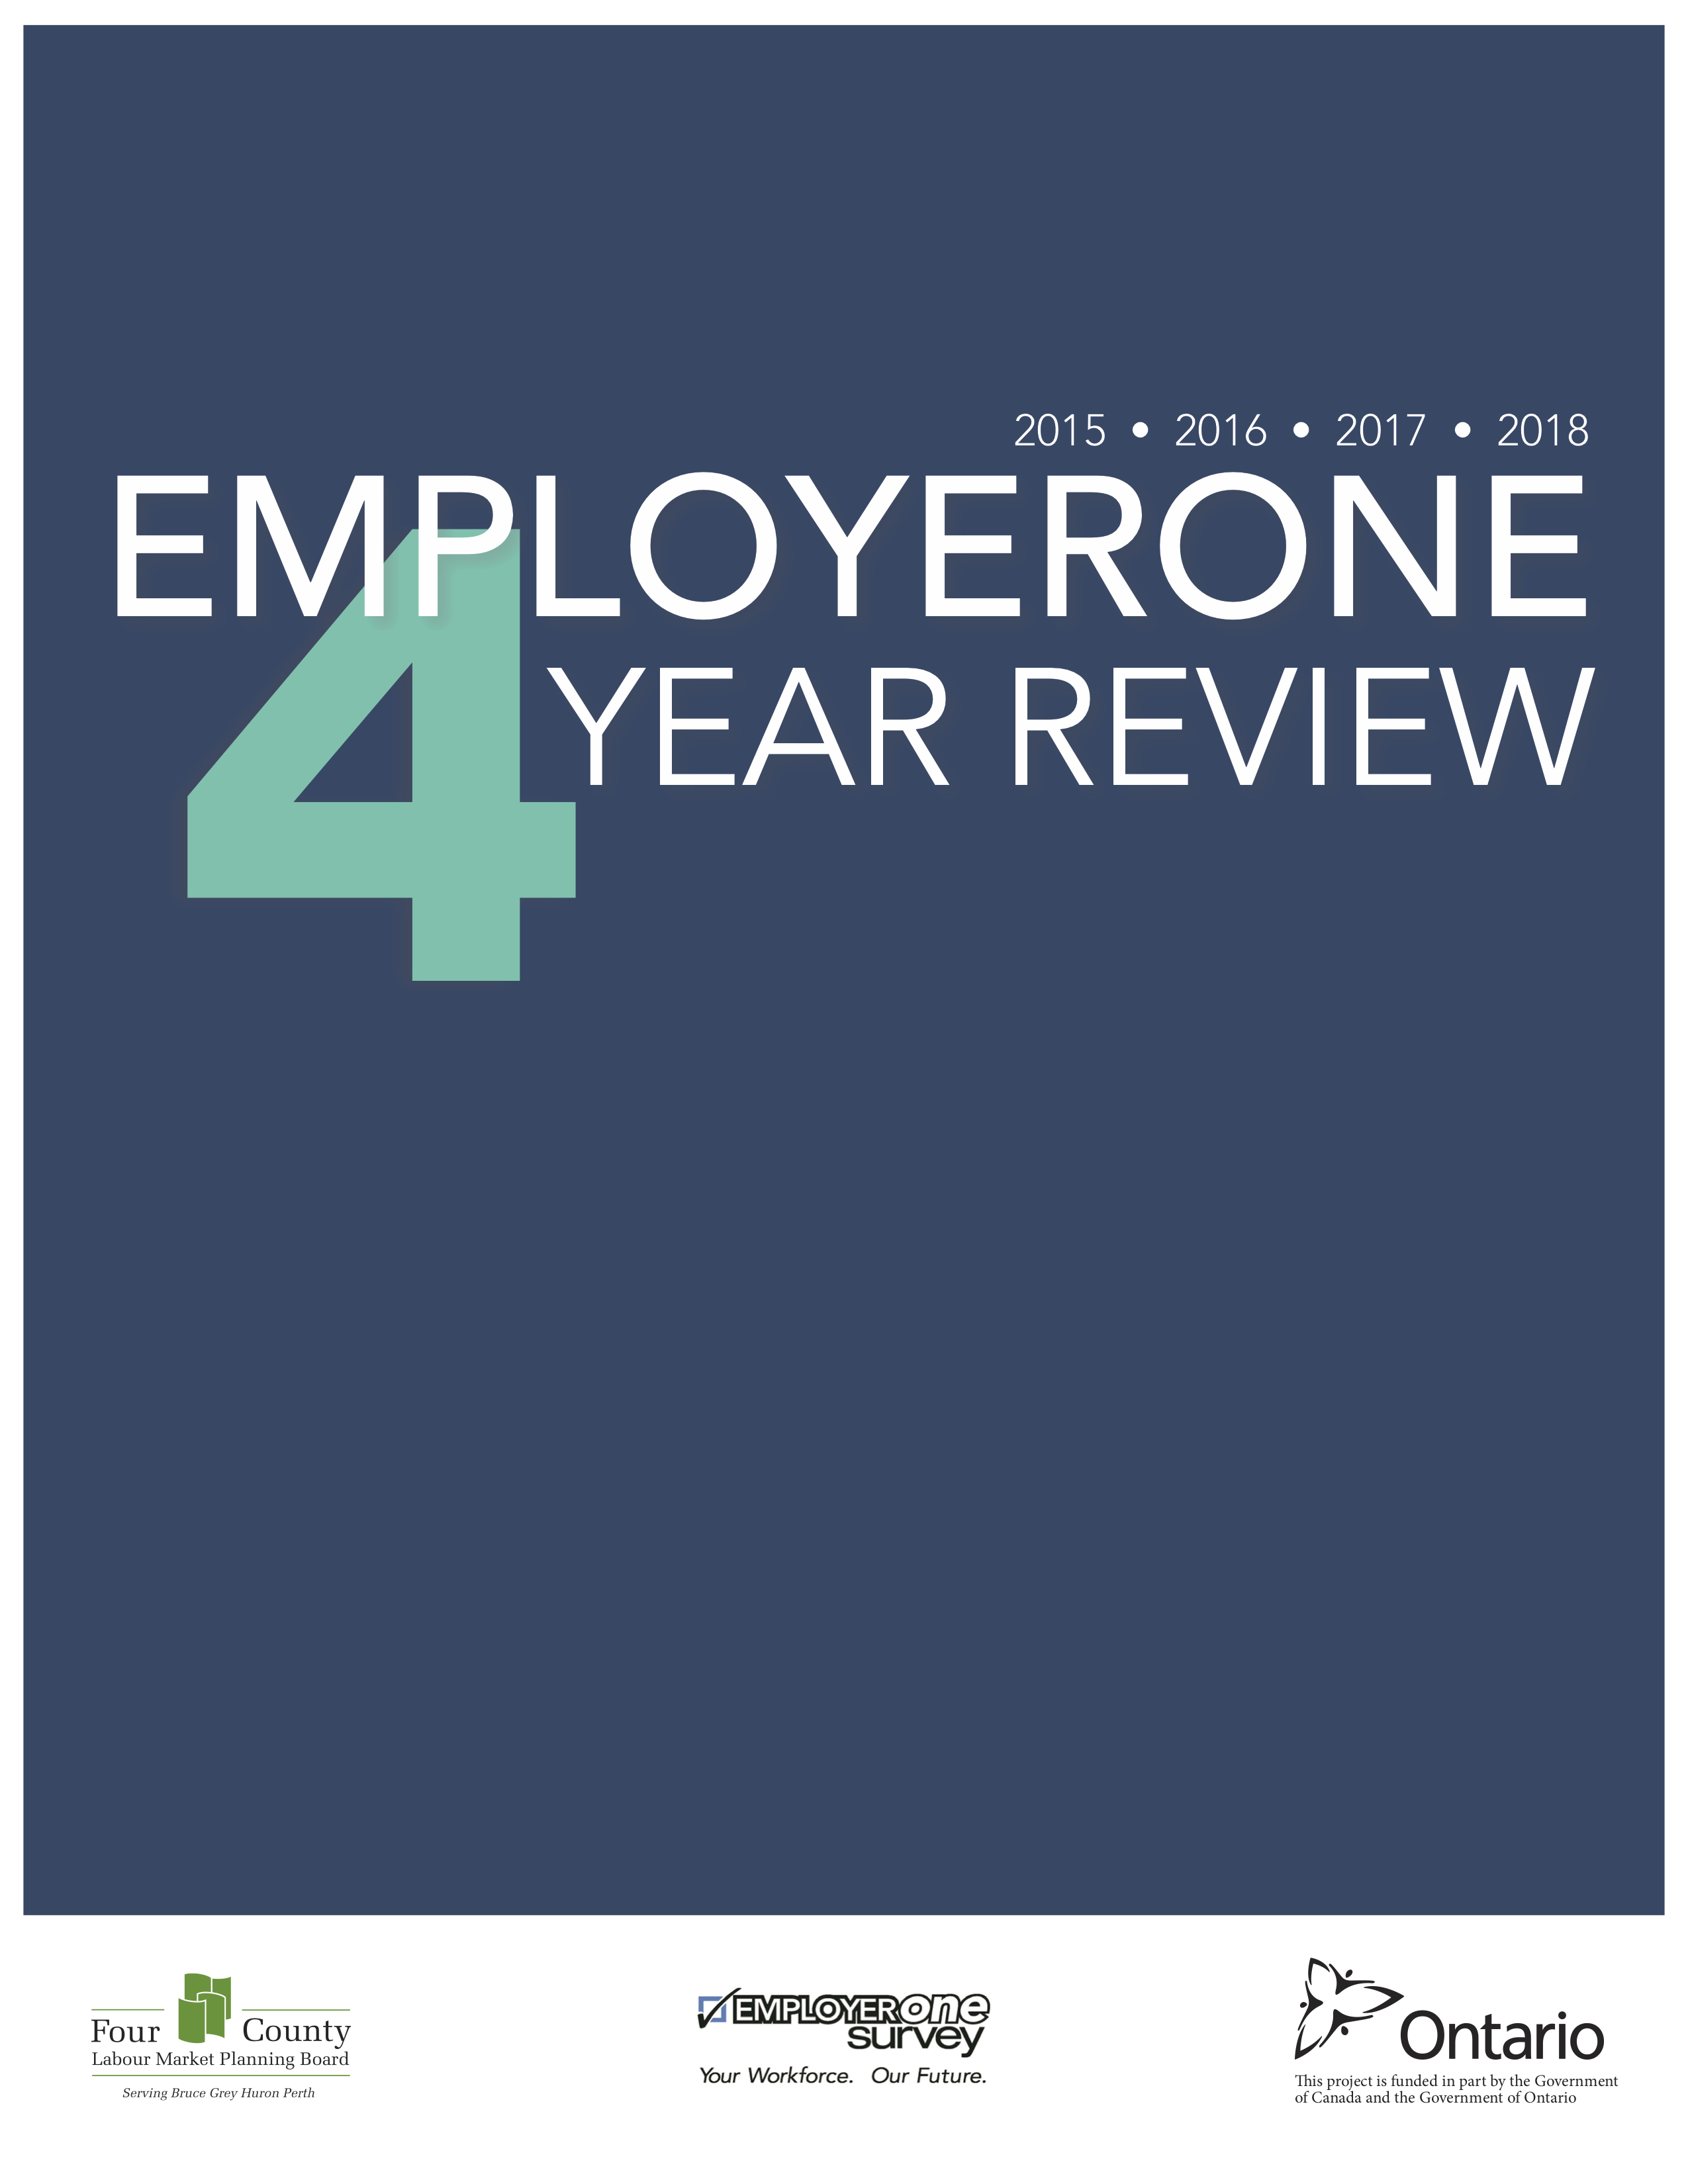 employerone four year review